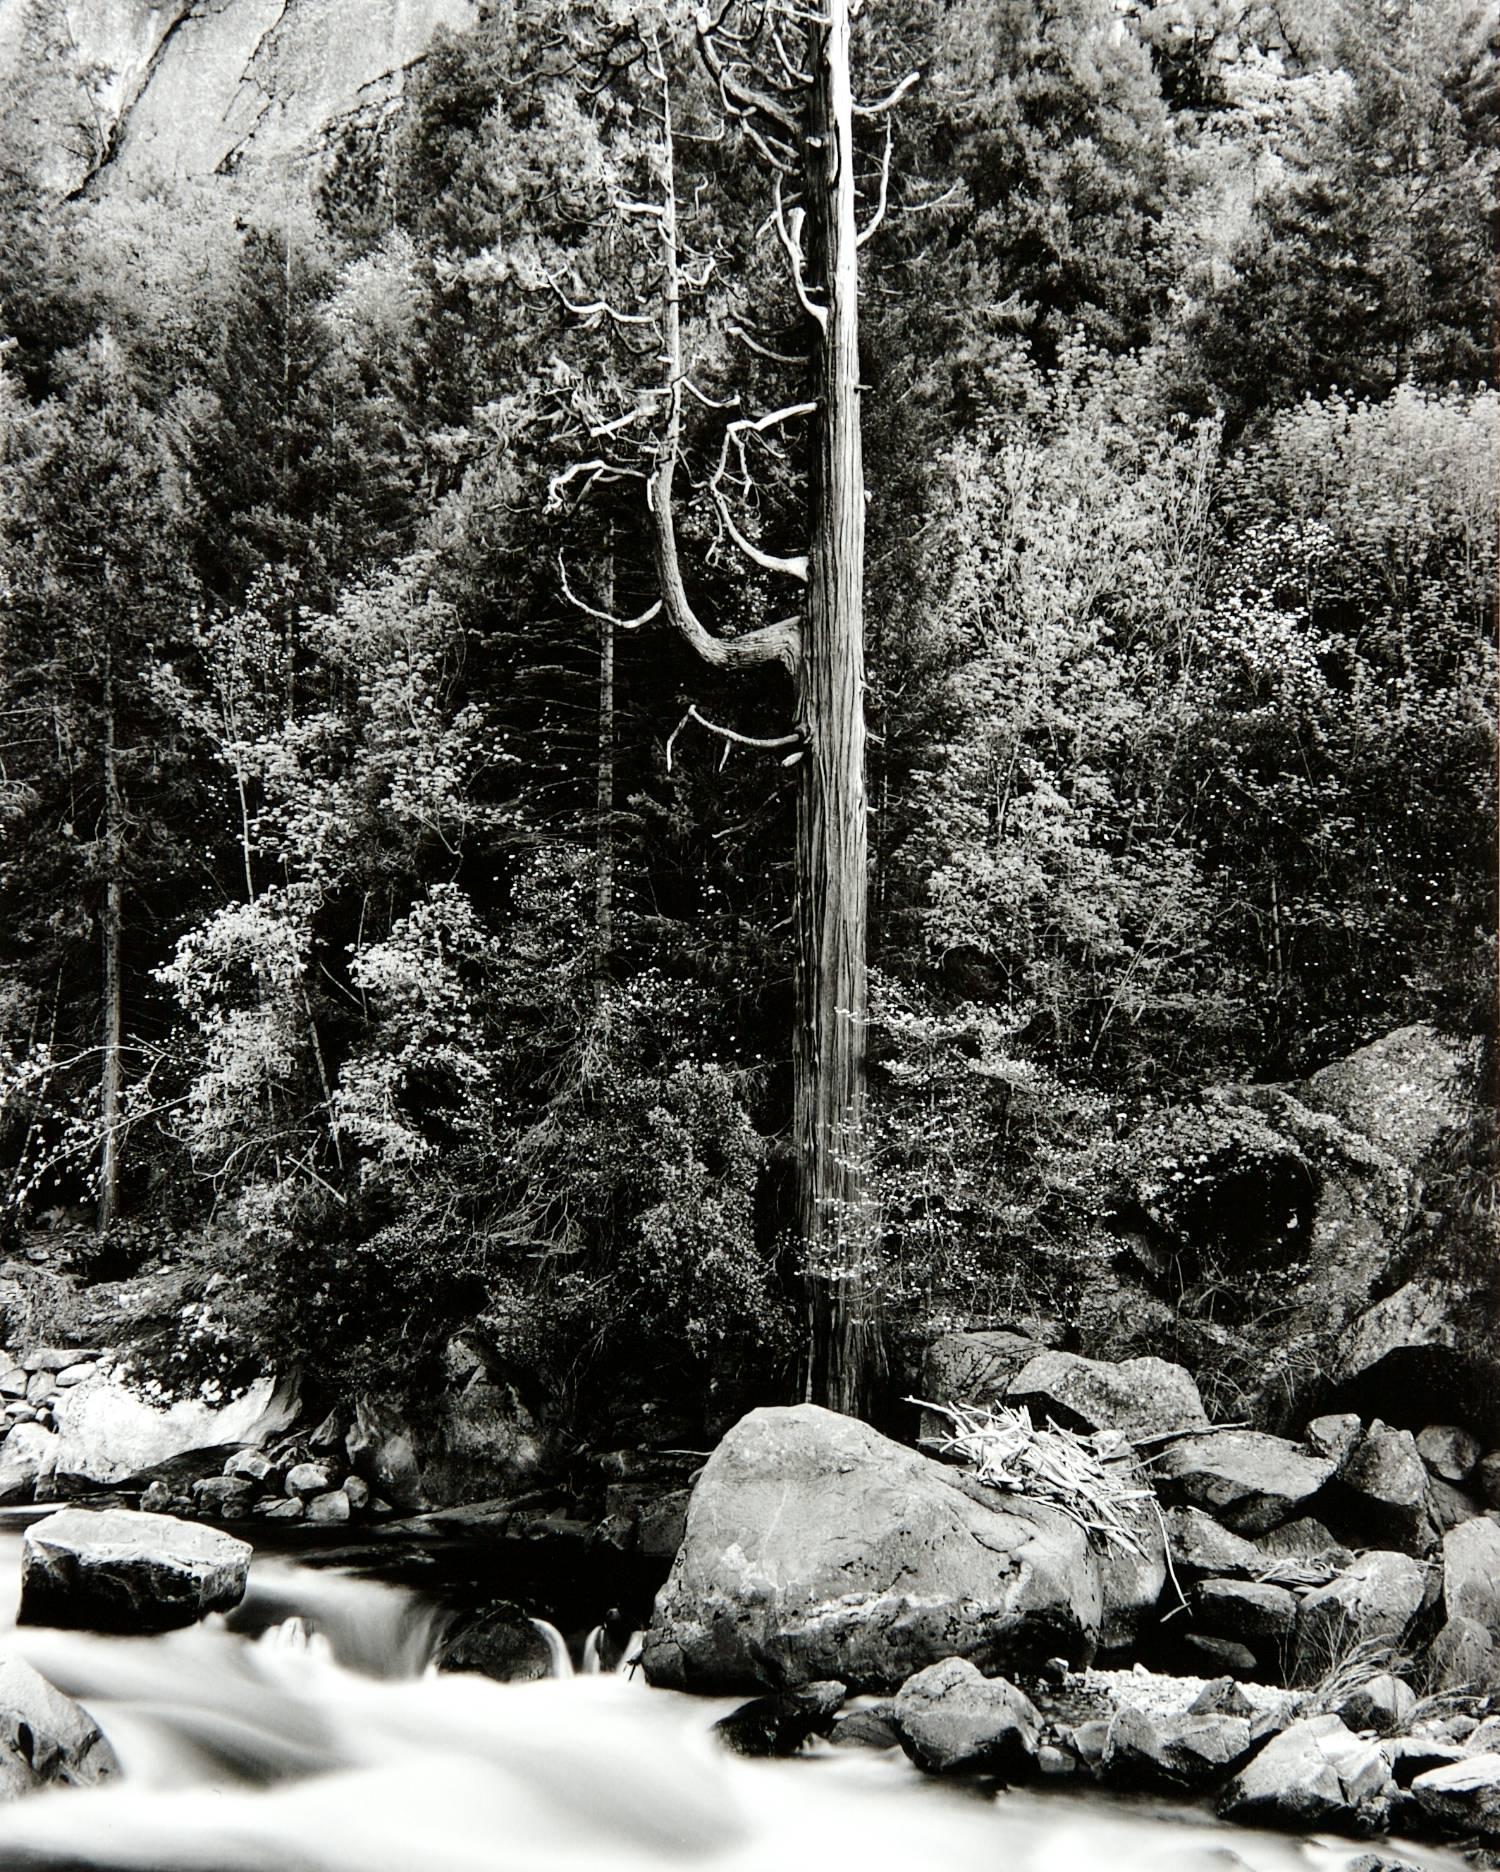 Redwood & Dogwood Along the Merced (Yosemite National Park)